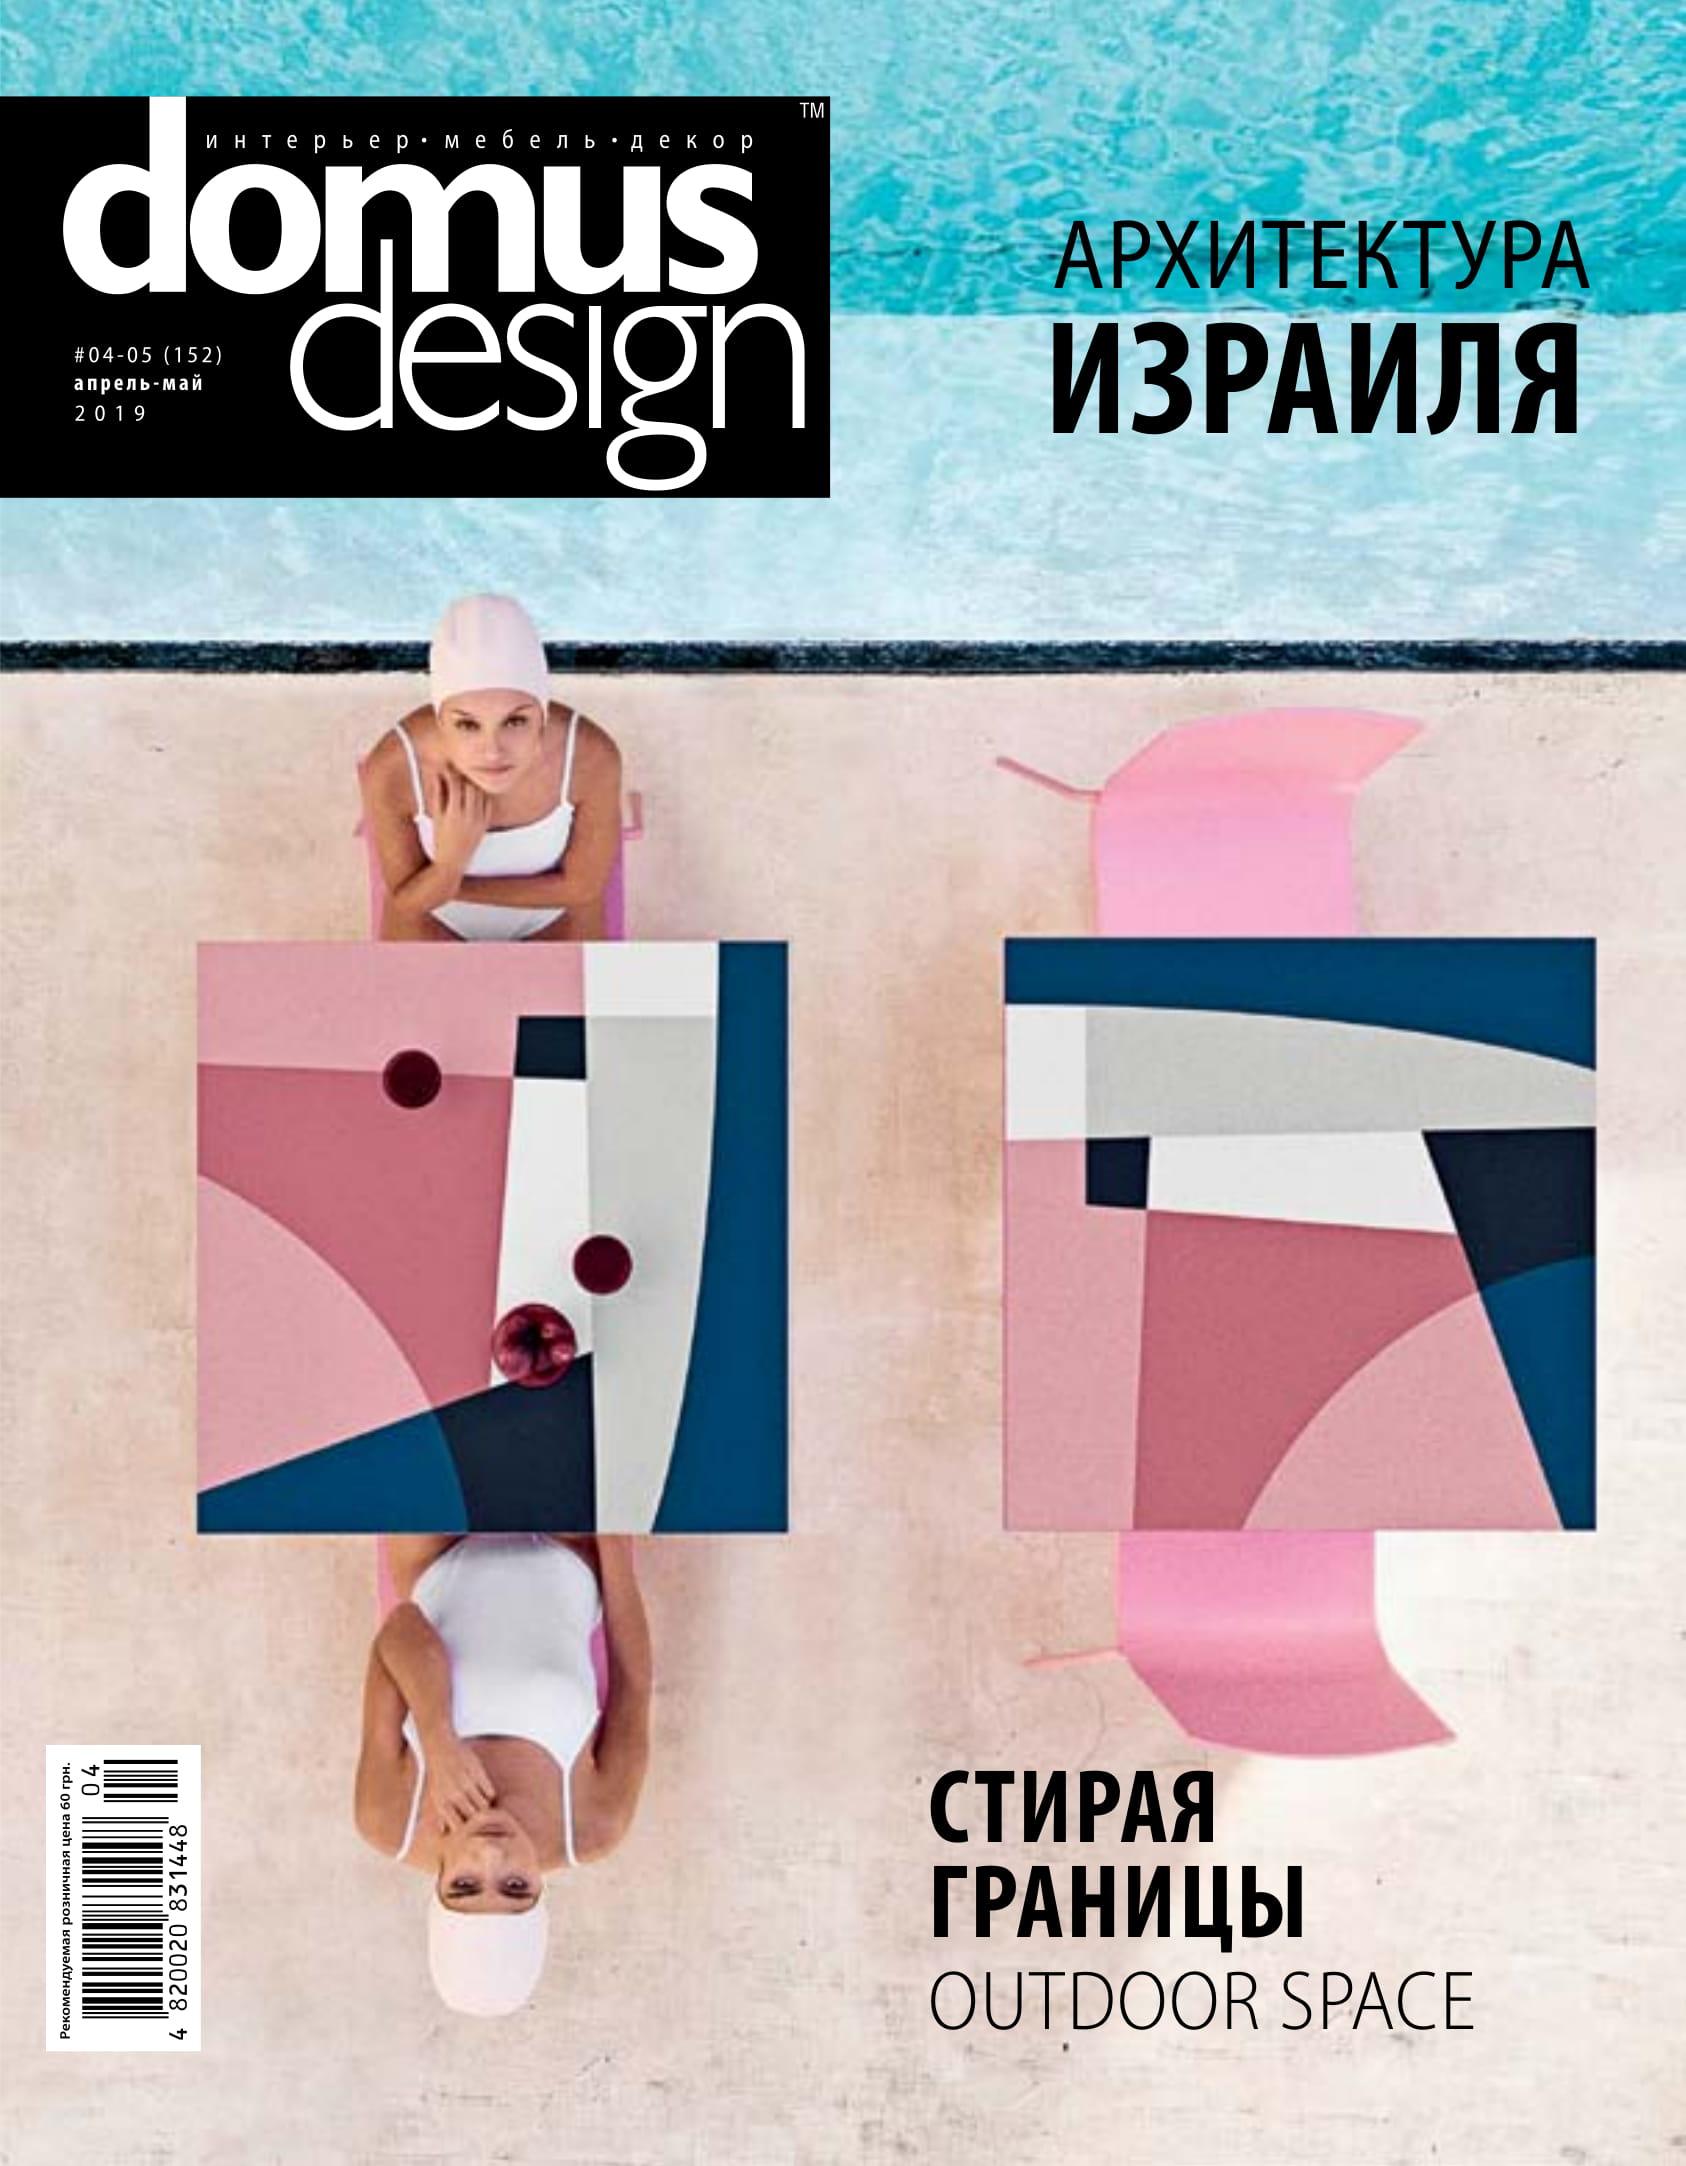 UKR_Domus magazine_04_05.2019_BRAFA report-1